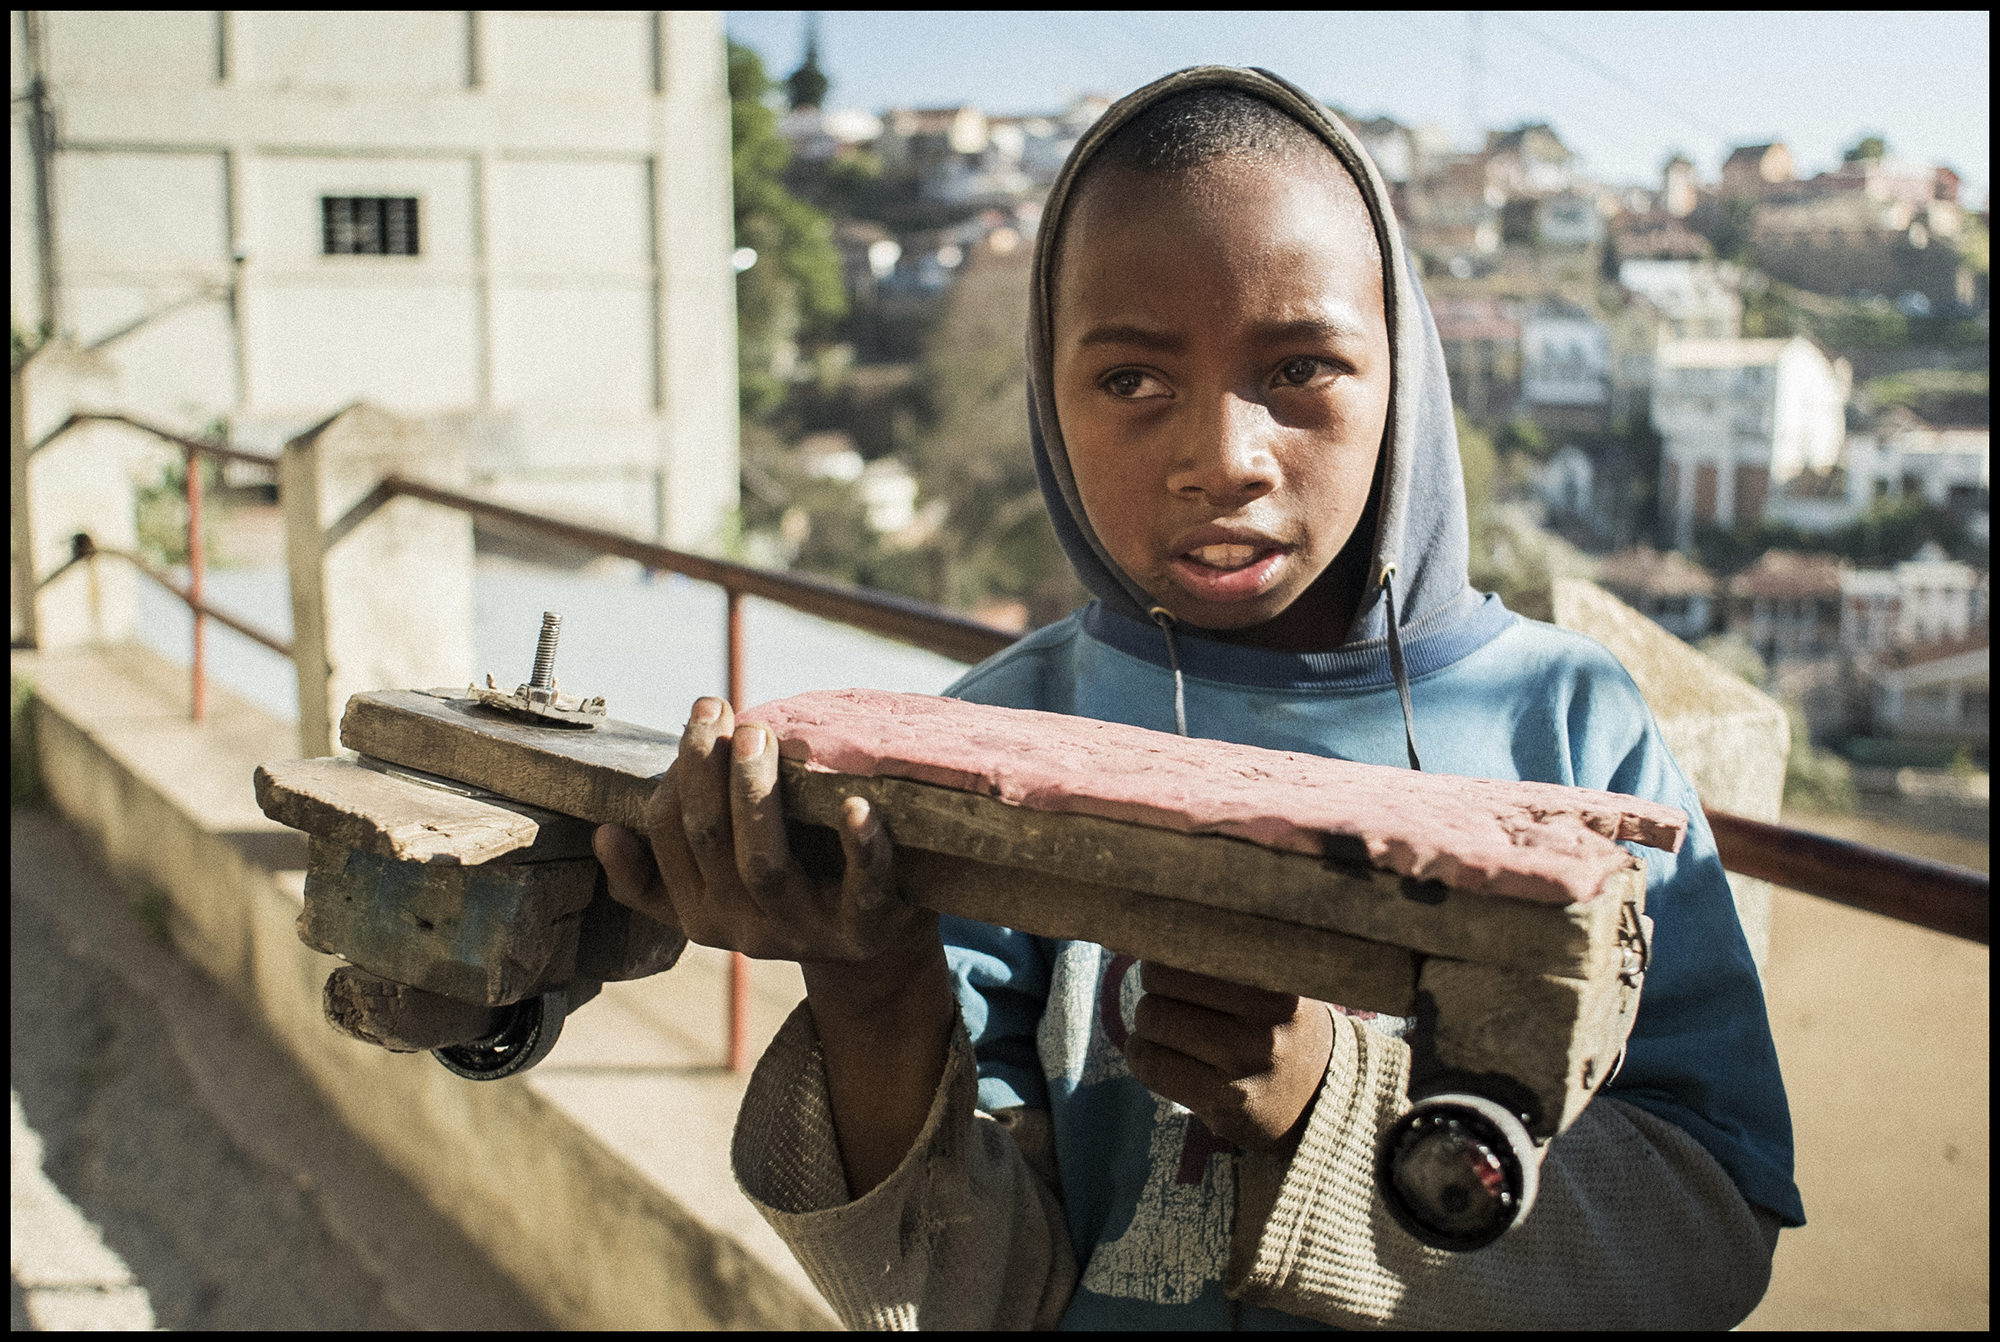 Digital Patrik Wallner Antananarivo Magagasy Skateboard LOWQ 2000P